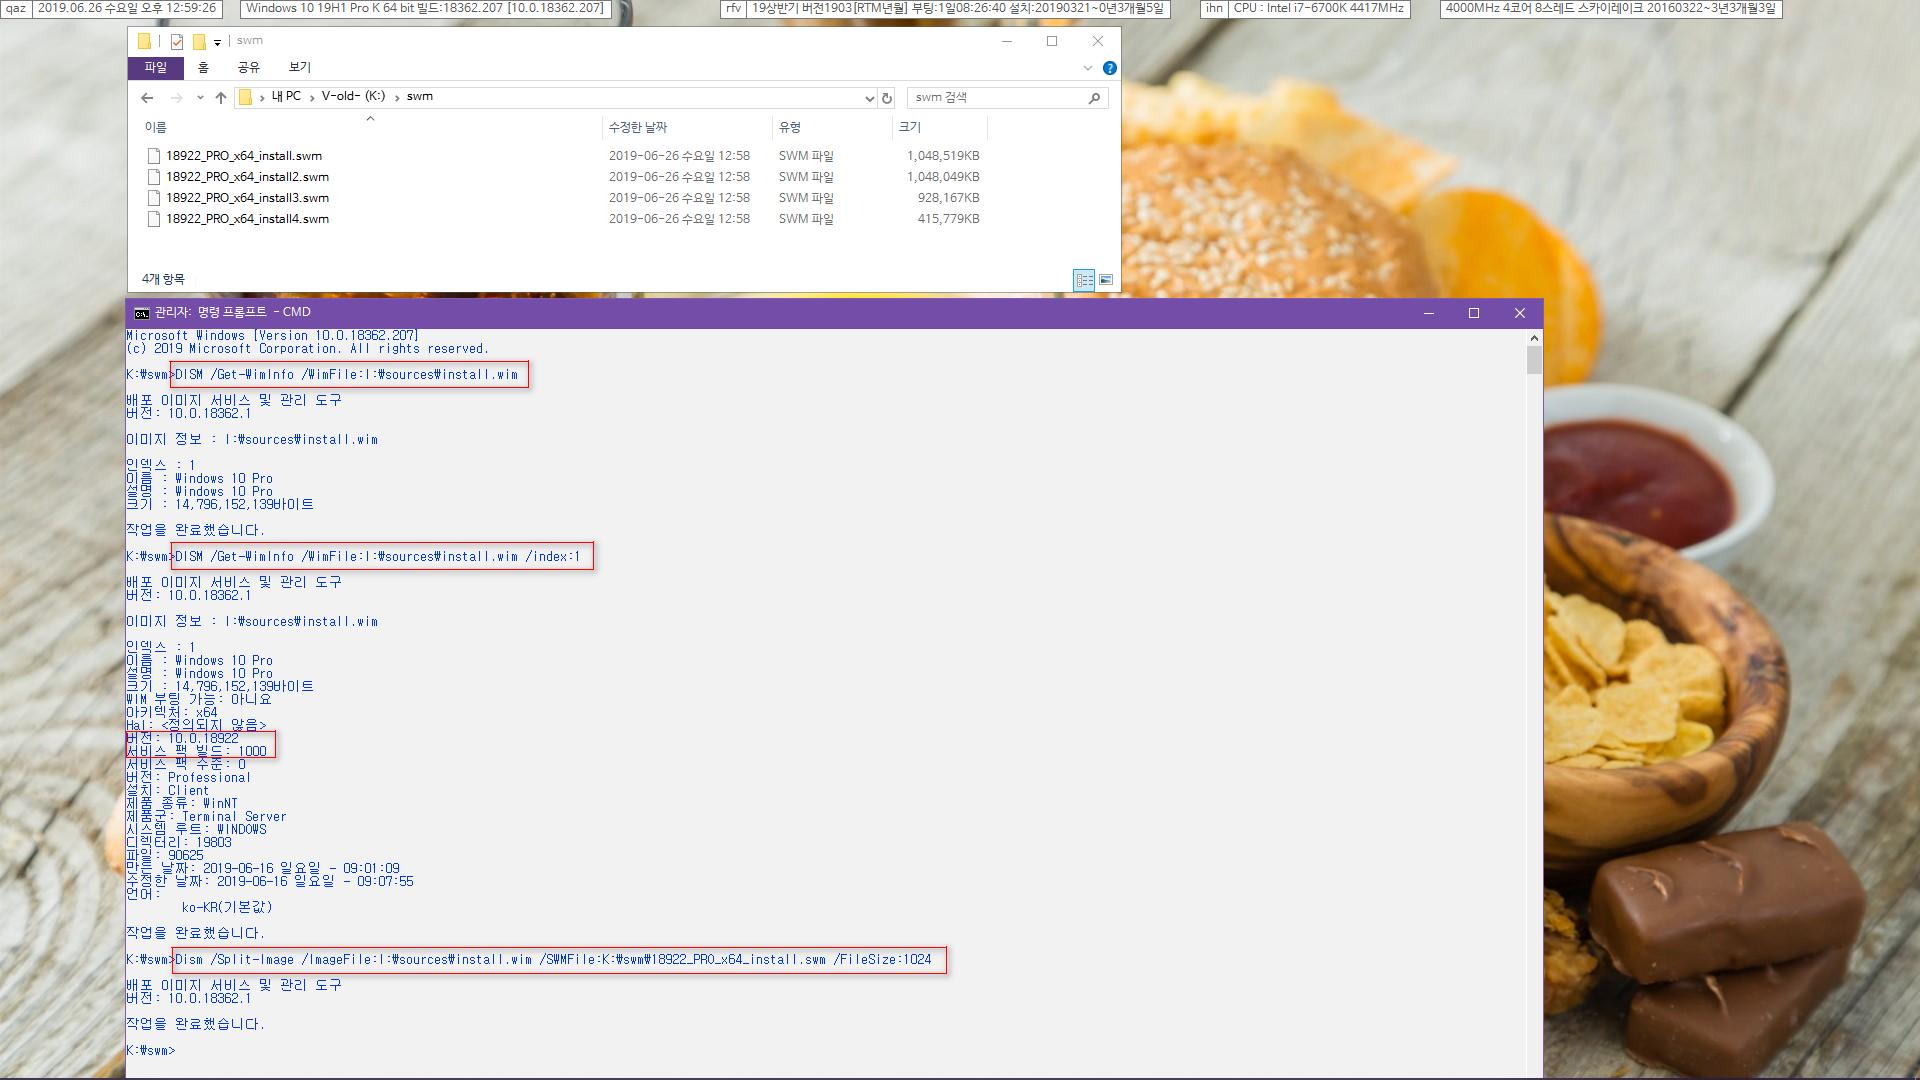 RSImageX로 swm 파일 설치 테스트 - ImageX로는 에러가 생겨도 DISM 으로 하면 swm 설치 되네요 2019-06-26_125926.png